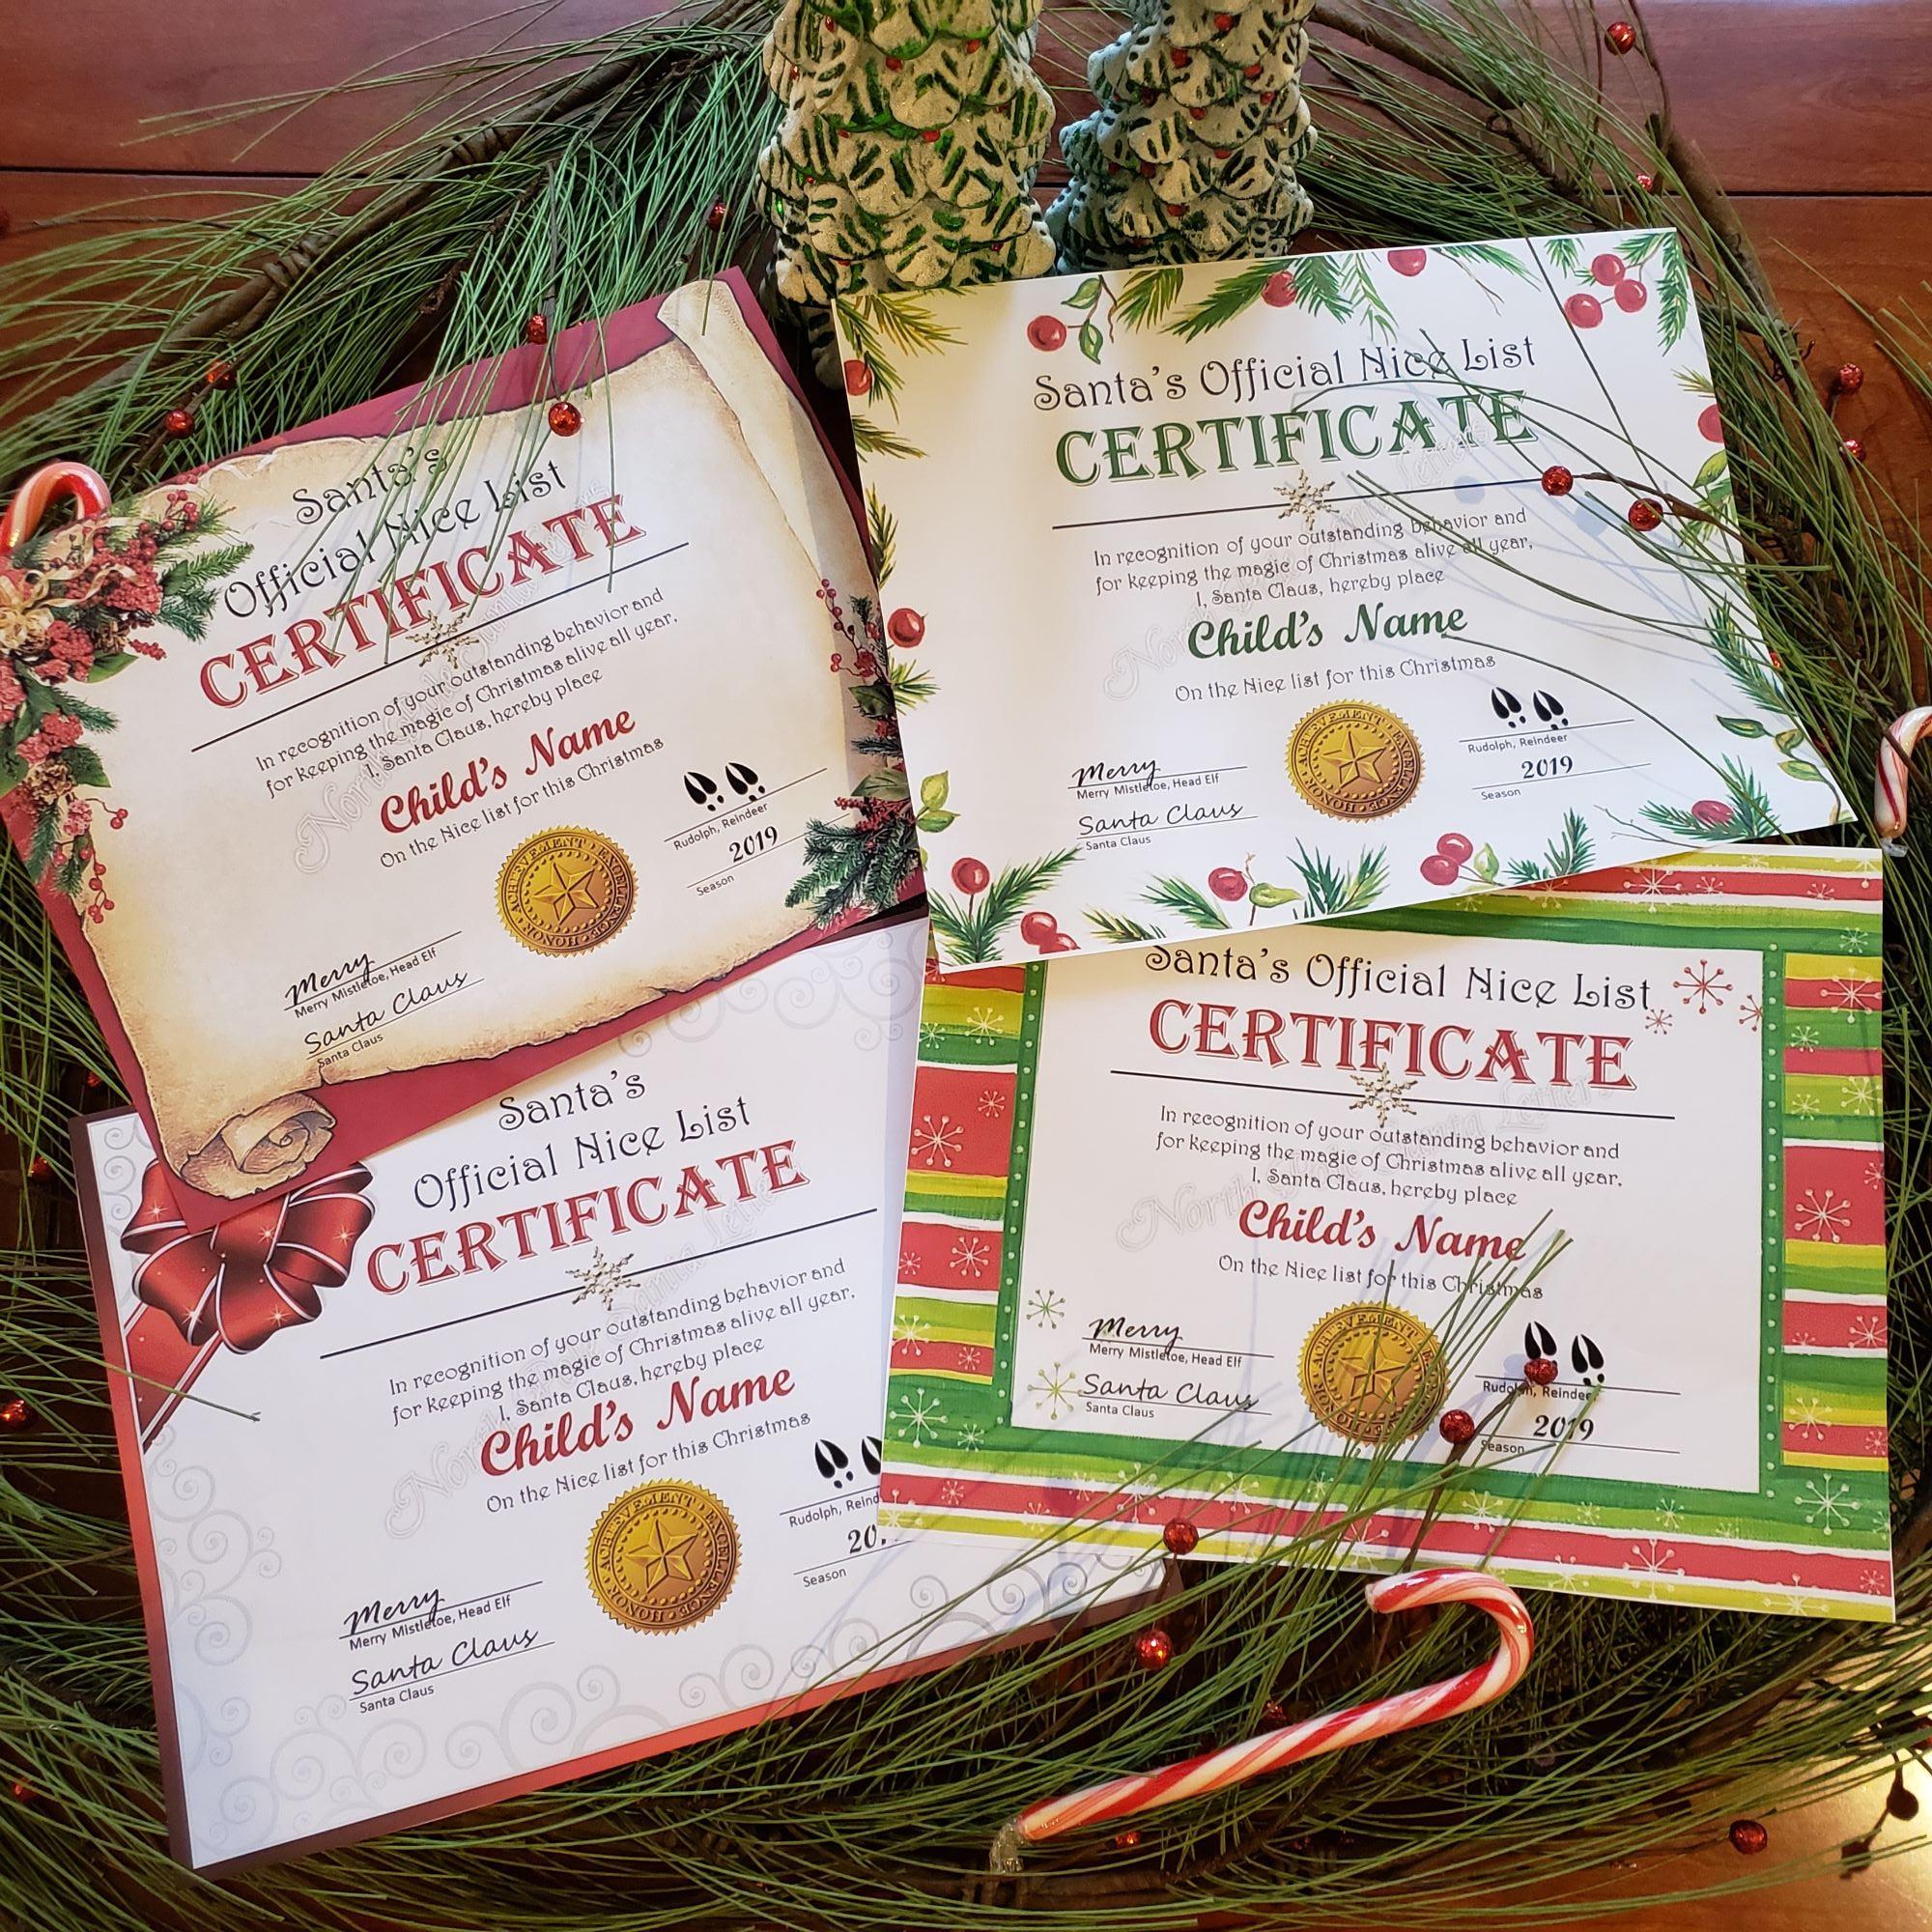 Santa's Nice List Certificates